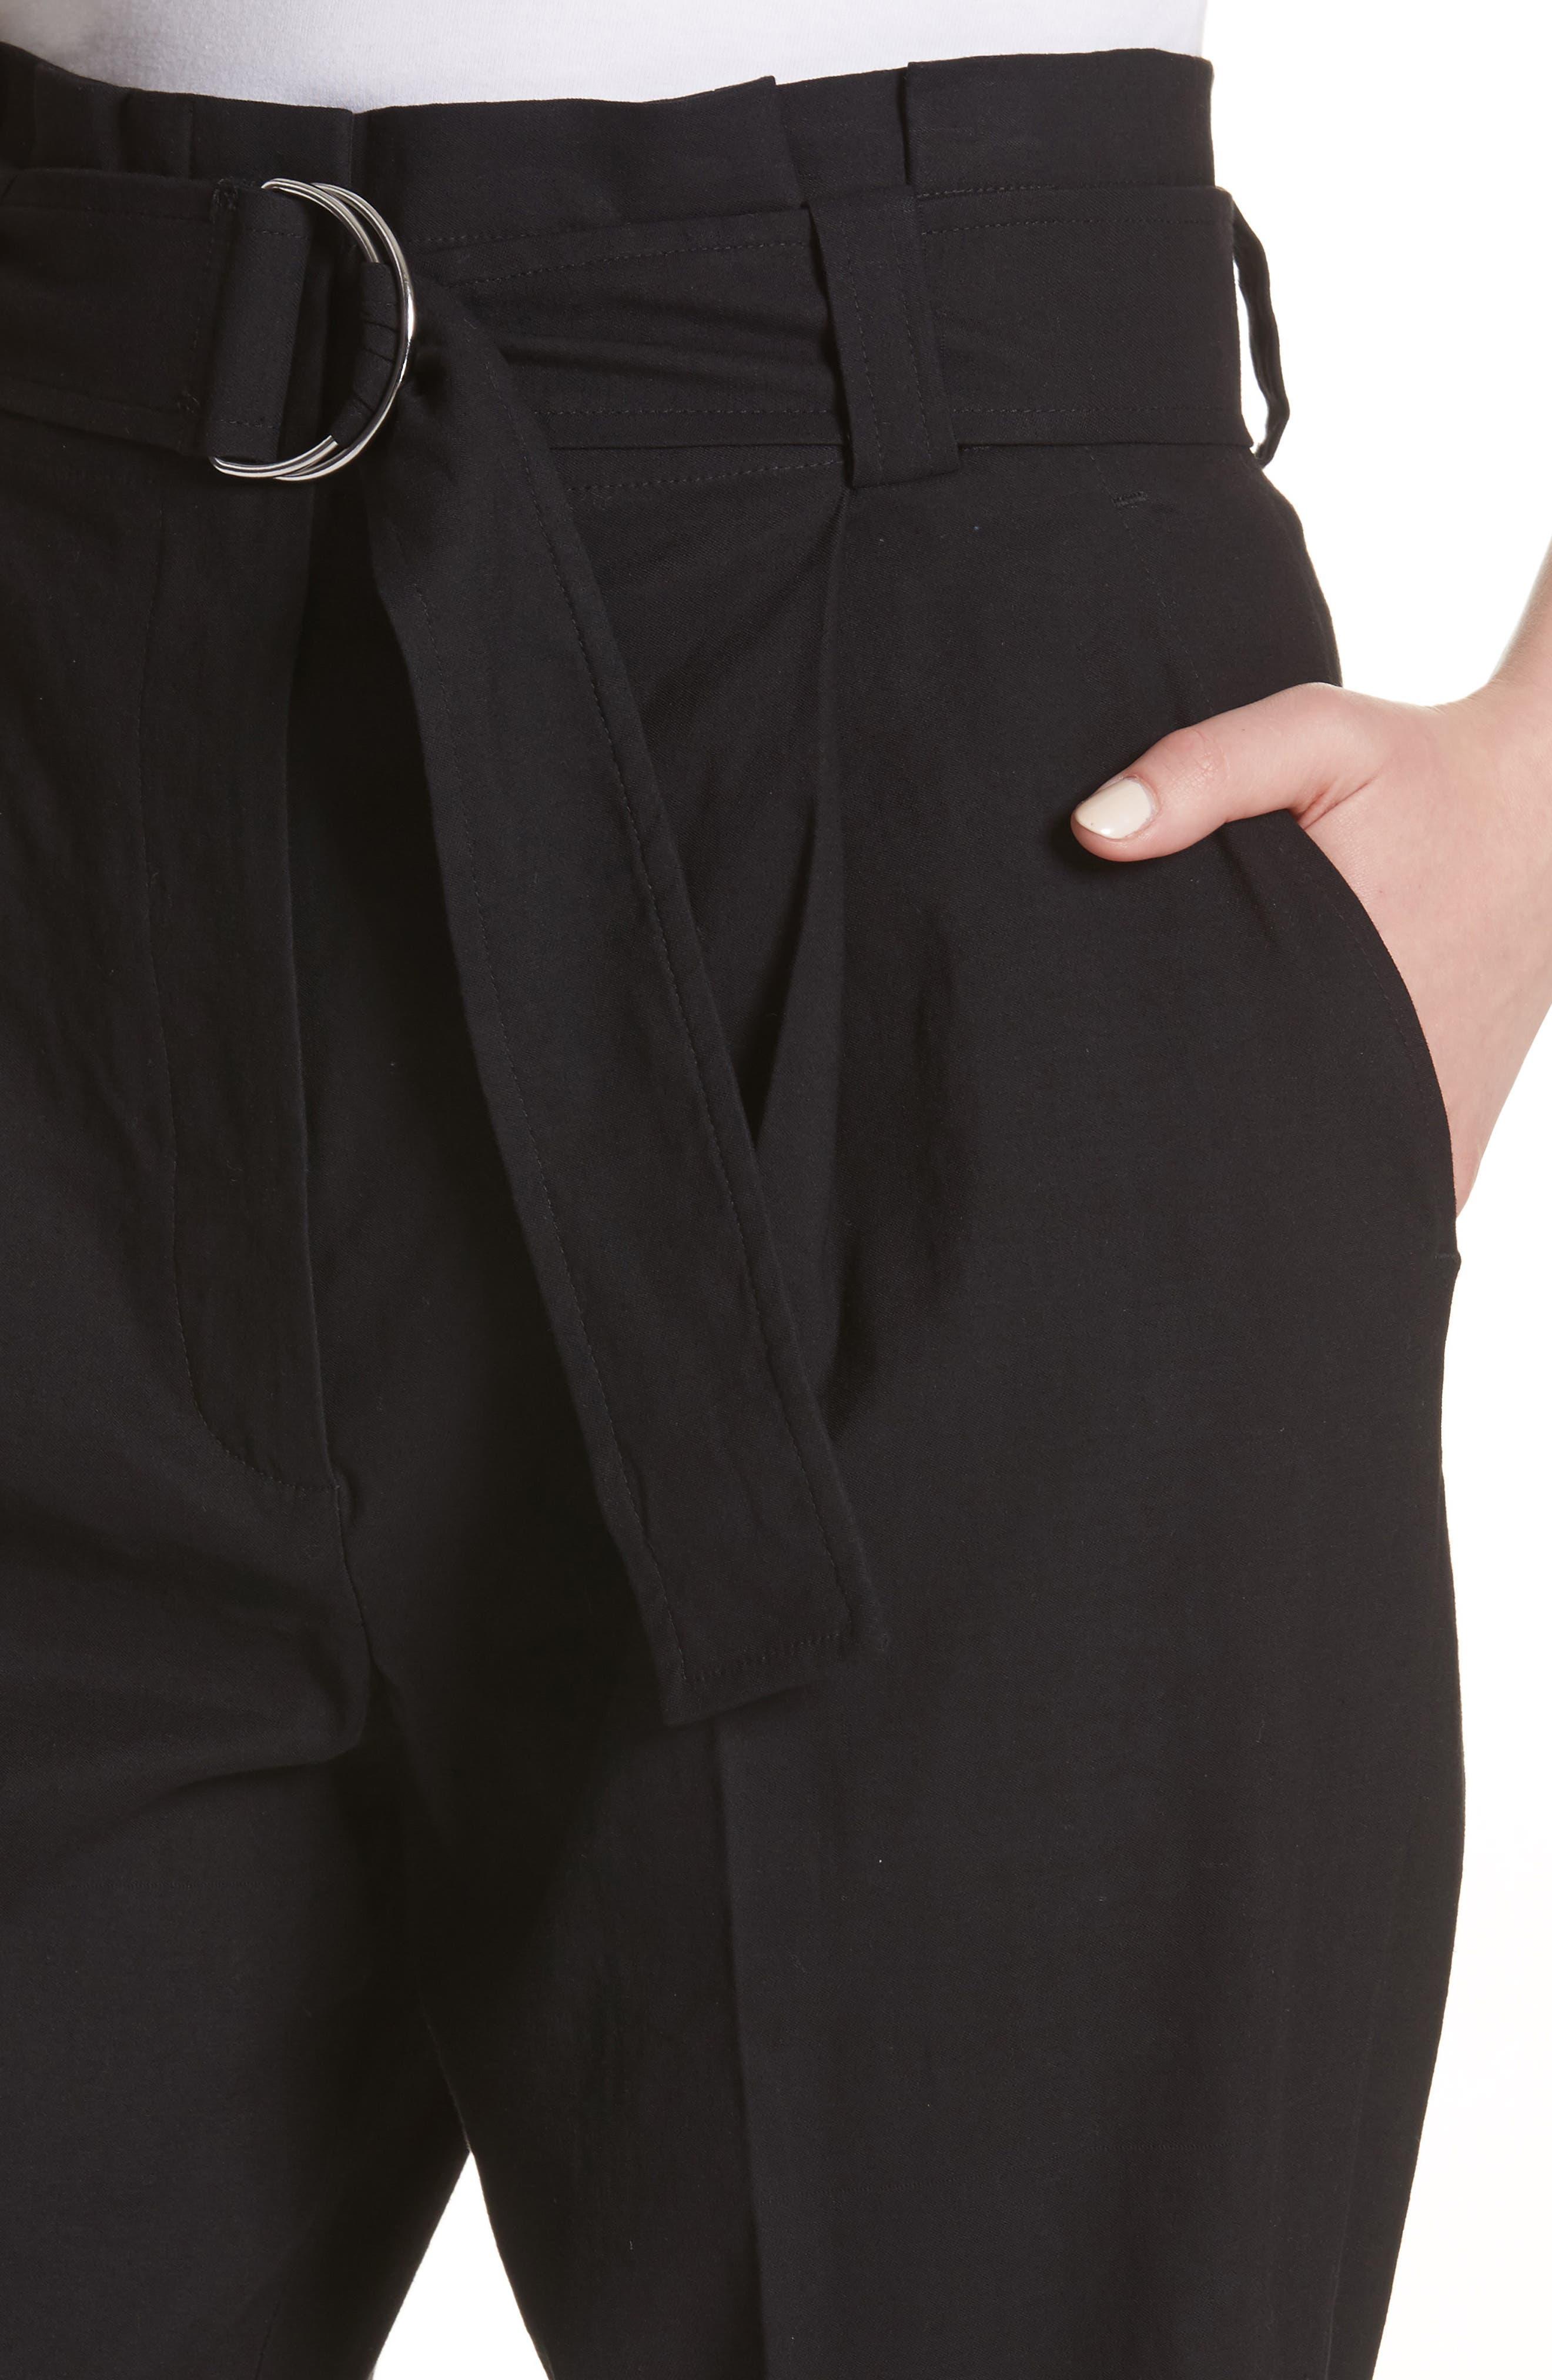 Diego High Waist Pants,                             Alternate thumbnail 4, color,                             001